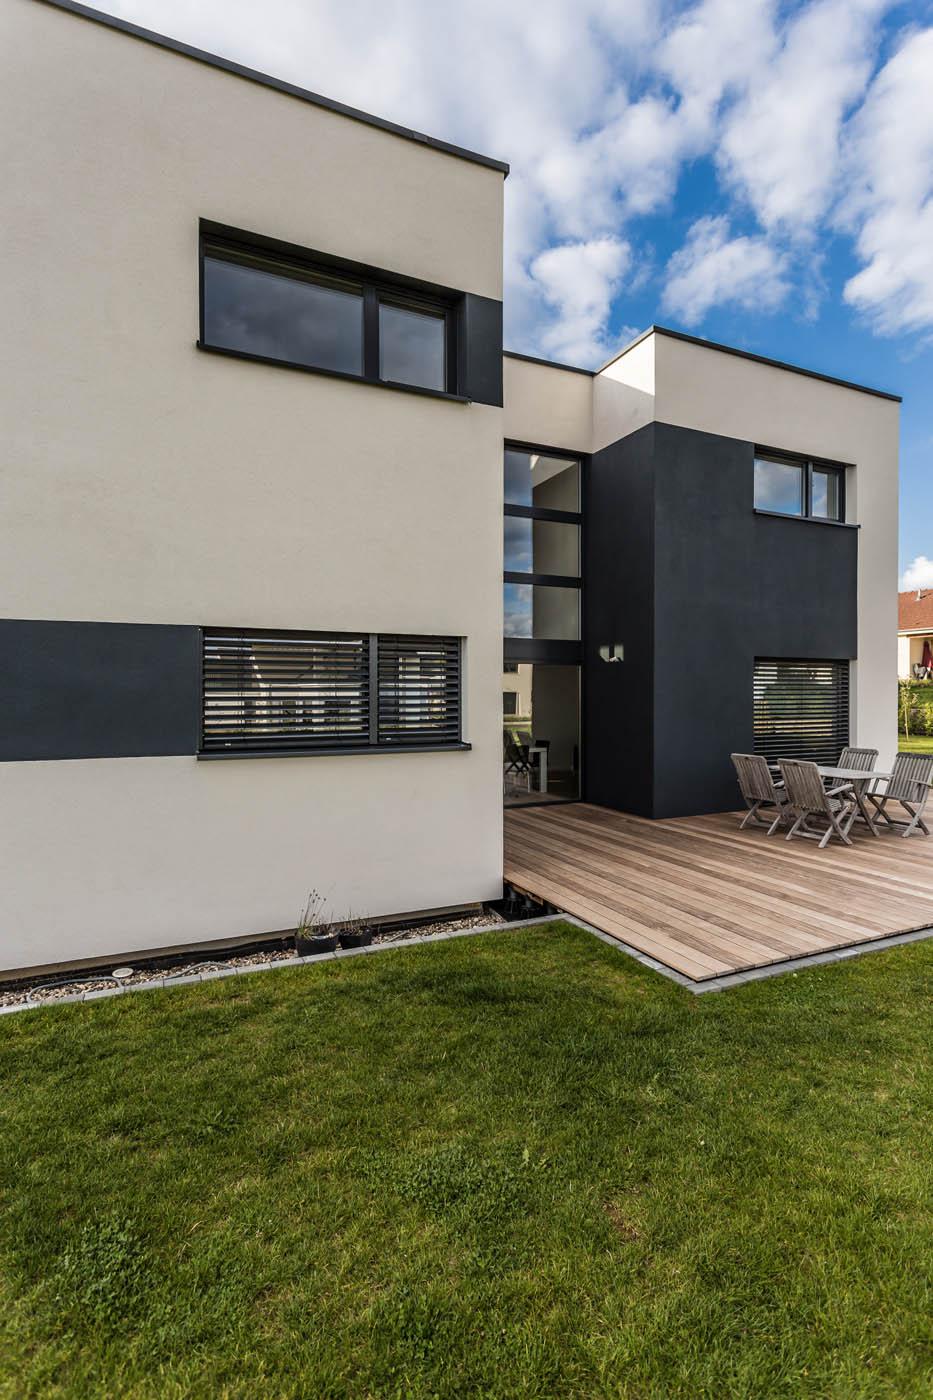 Maison bois design maison bois with maison bois design for Design et maison